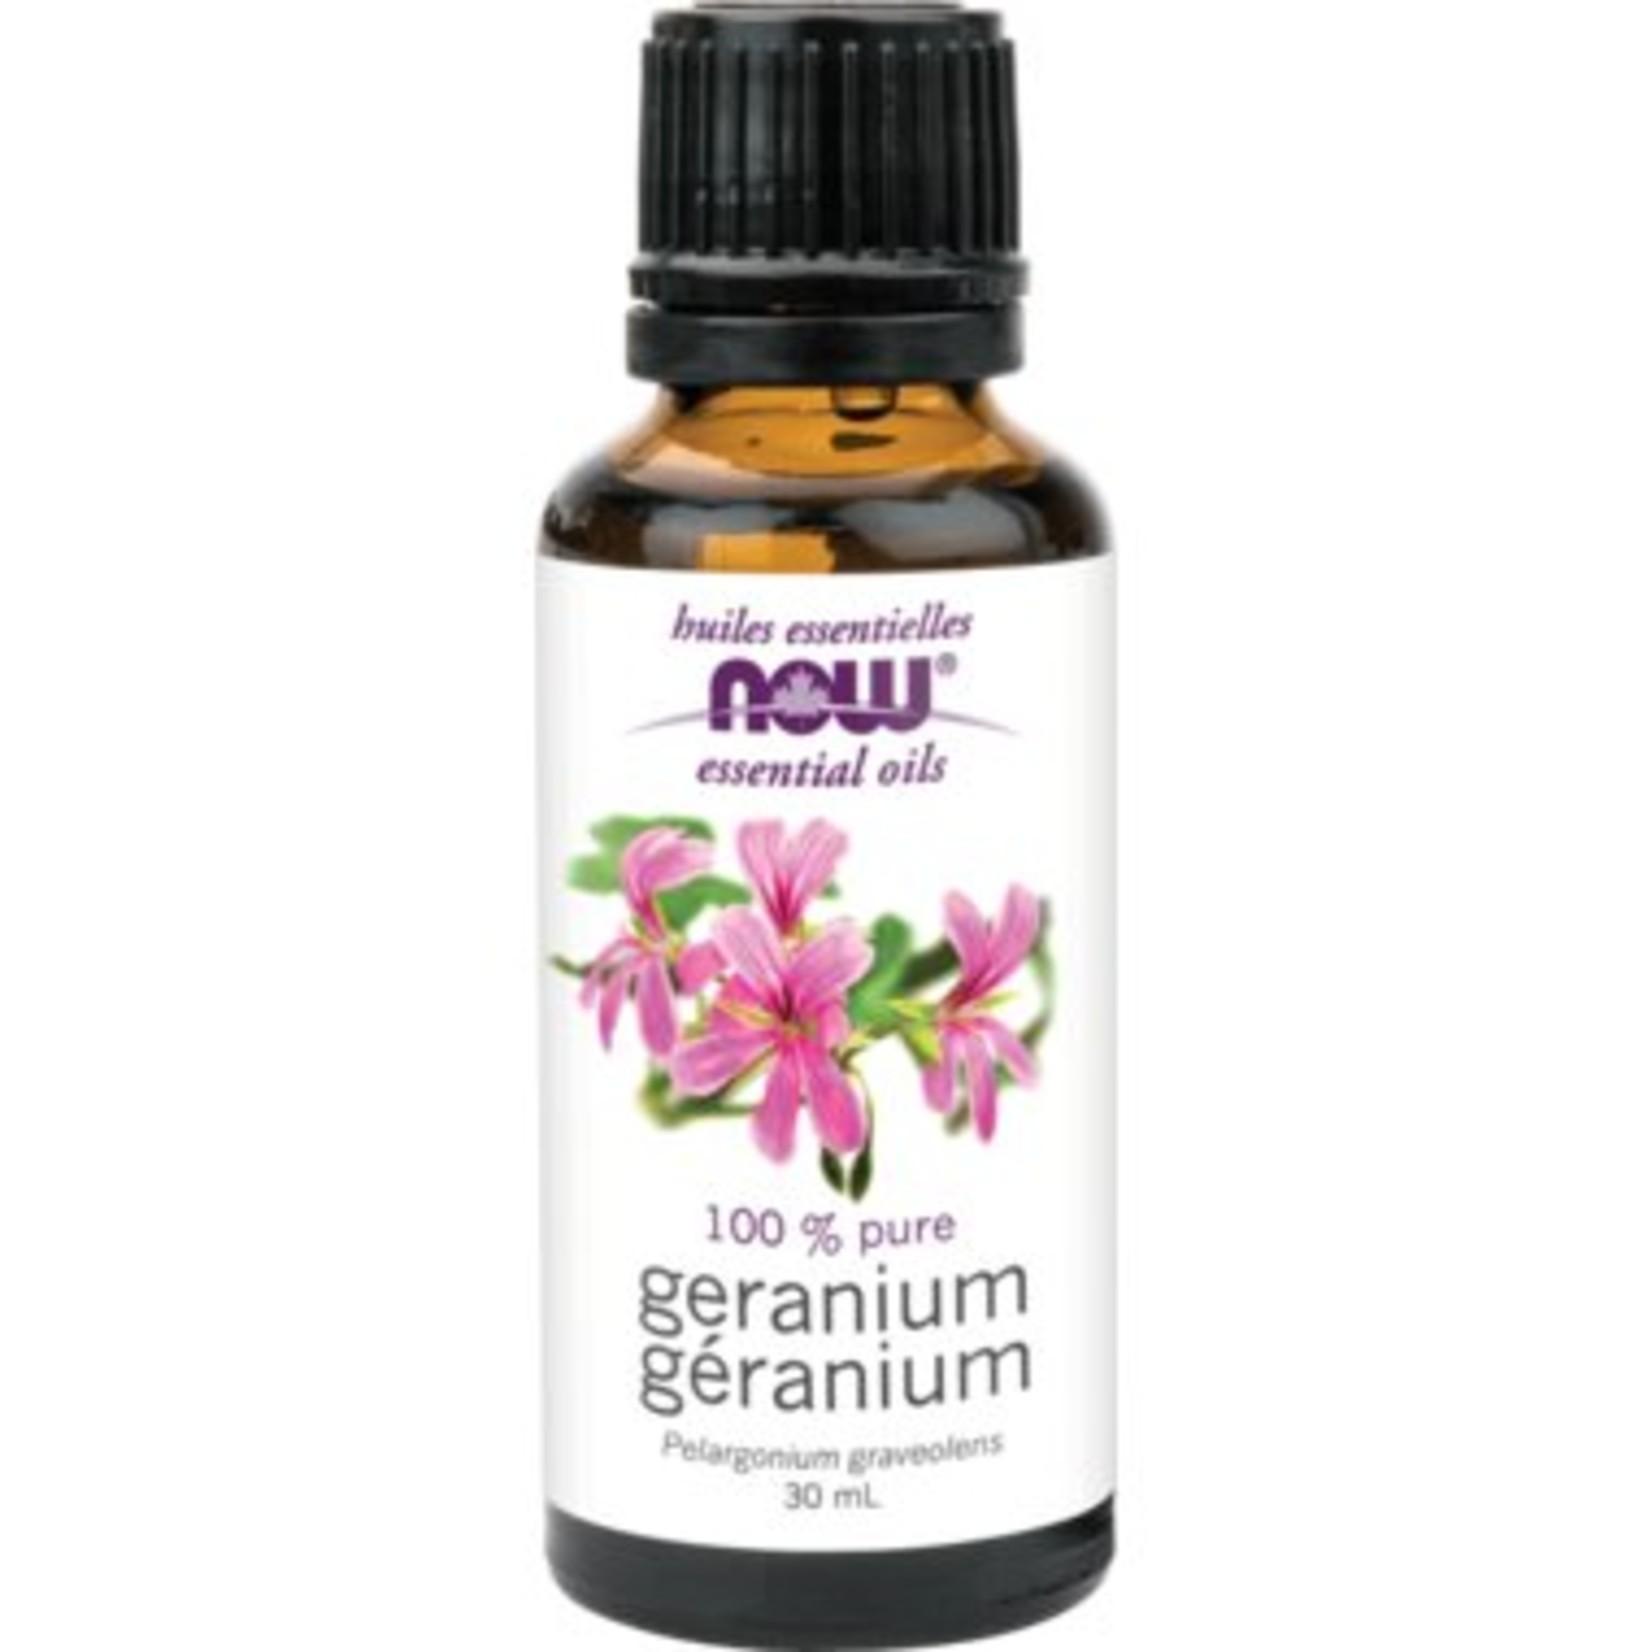 NOW NOW Geranium Oil, Pure 30mL